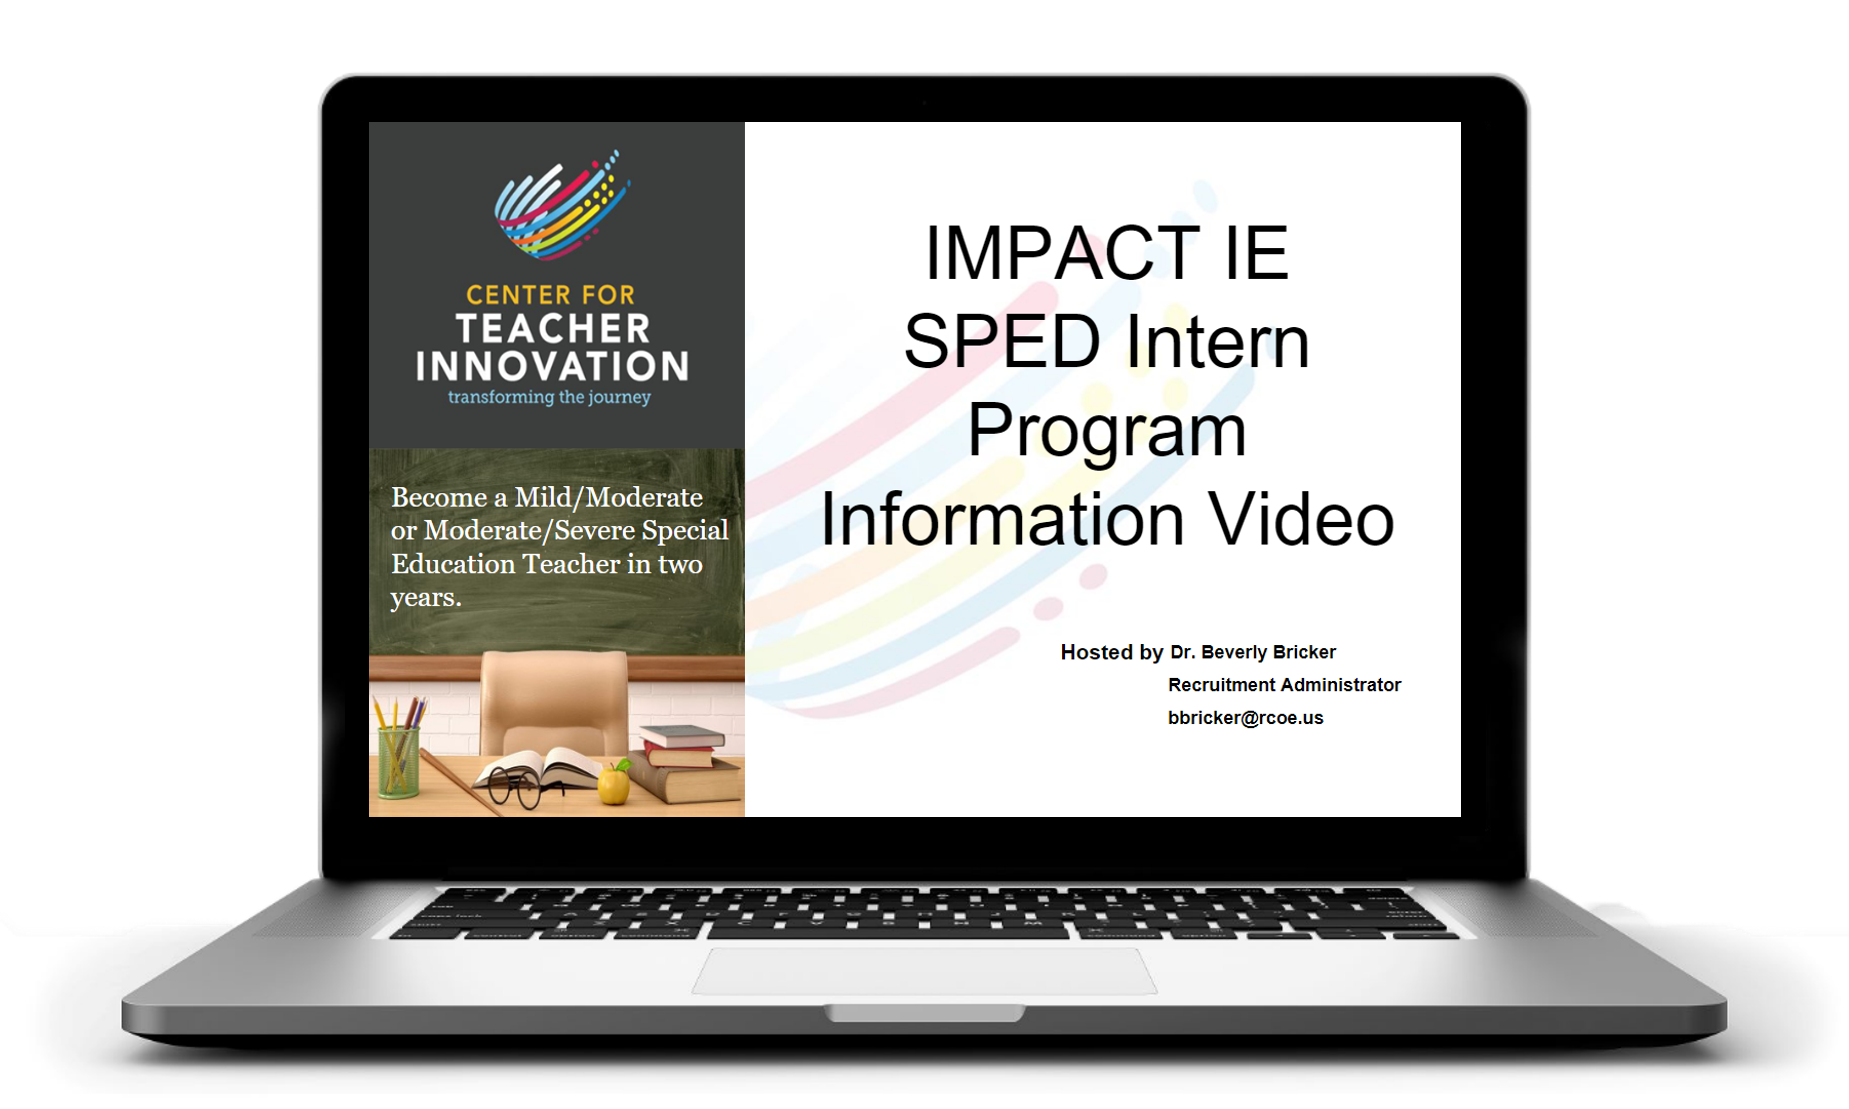 Laptop that displays website for Teacher Innovation